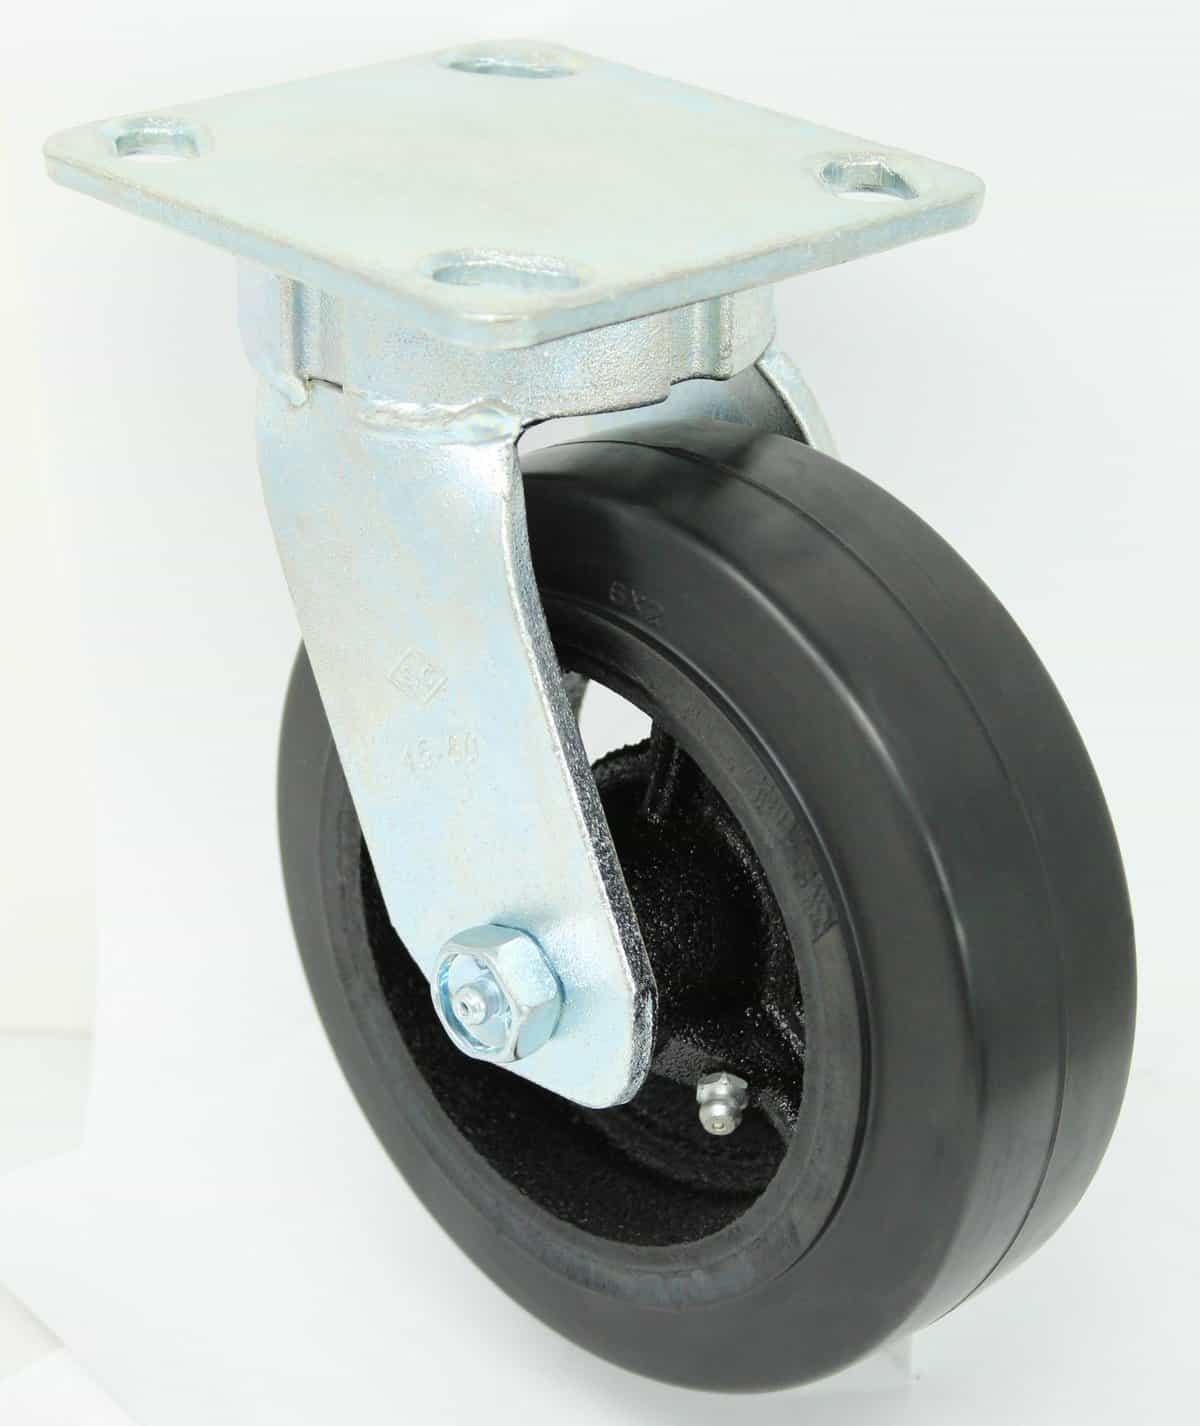 Swivel Kingpinless Polyurethane Steel Caster 4 x 4-1/2 Top Plate